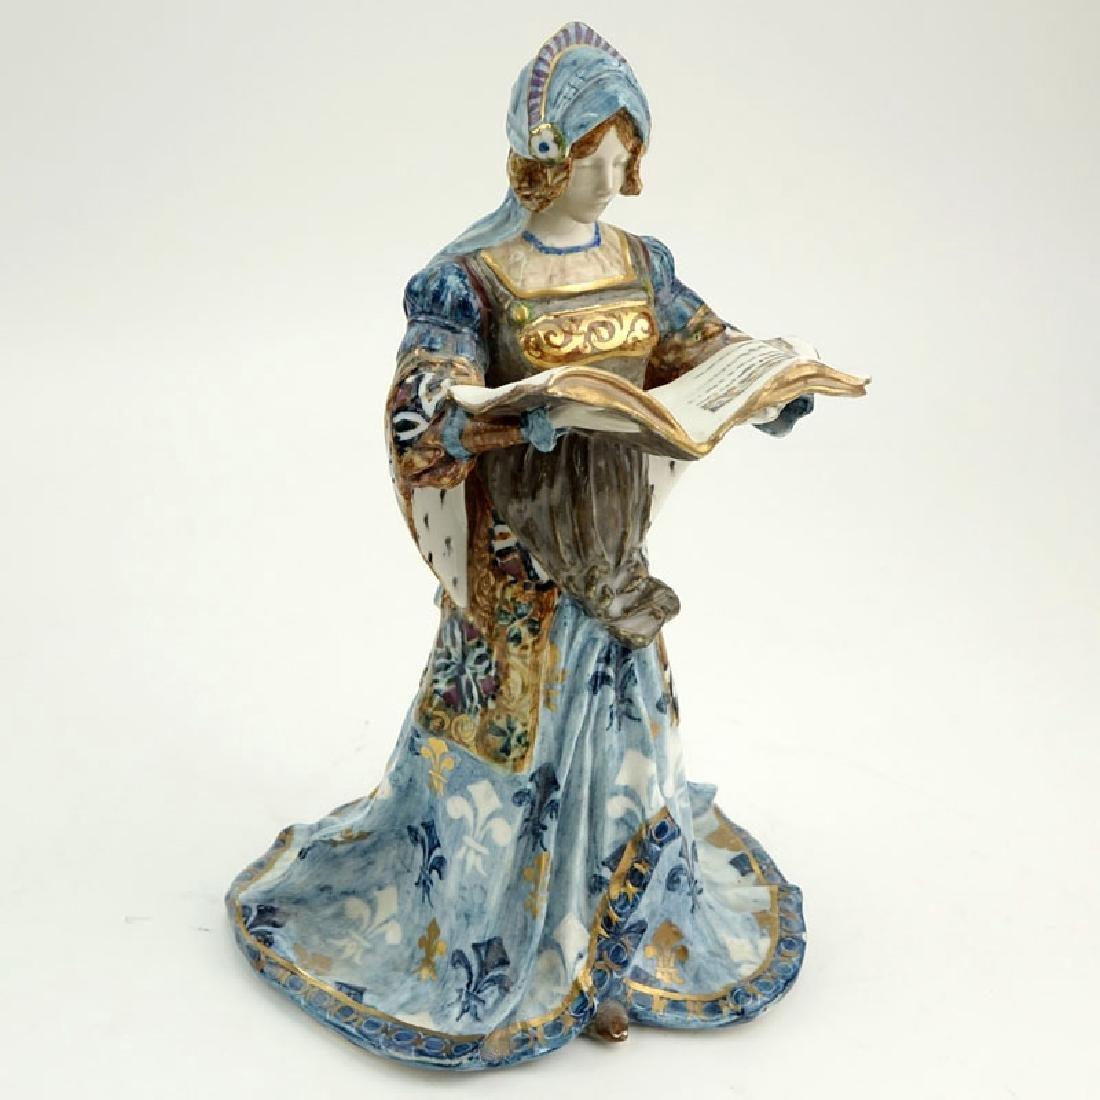 Antique Aloys, French (19th Century) Art Nouveau Glazed